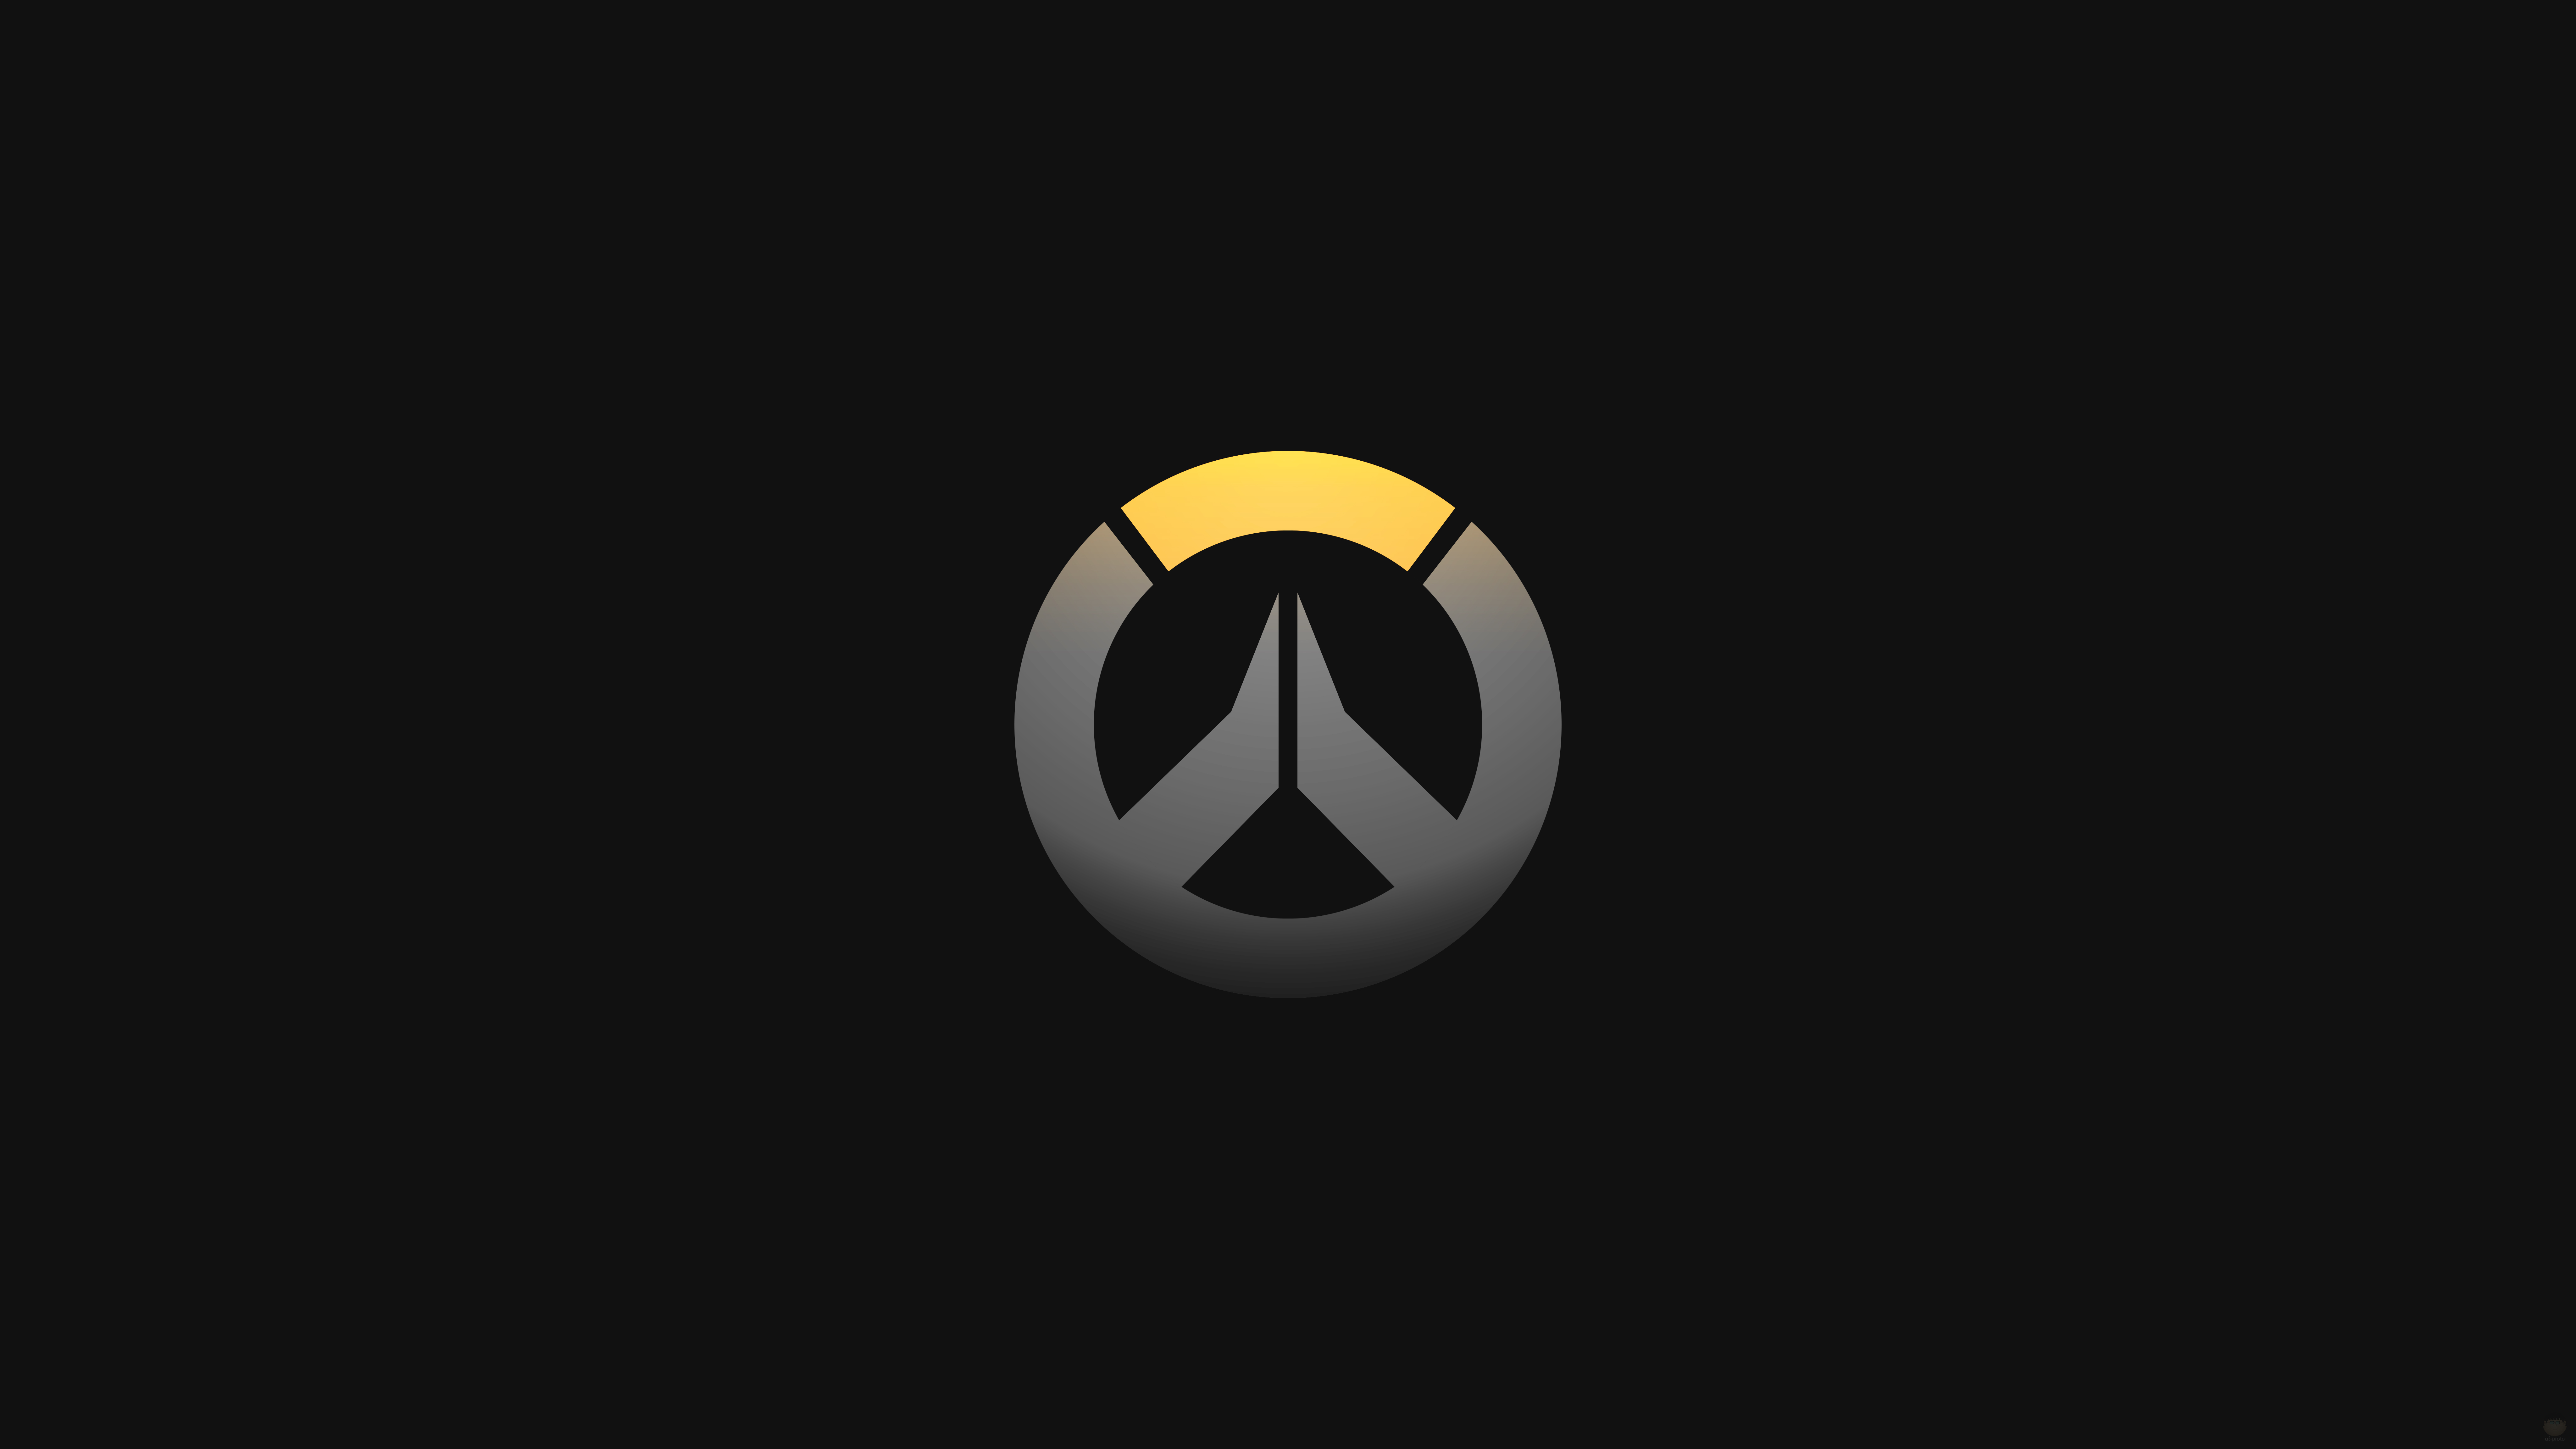 Overwatch Wallpaper Dark 8k By Al Proto On Deviantart